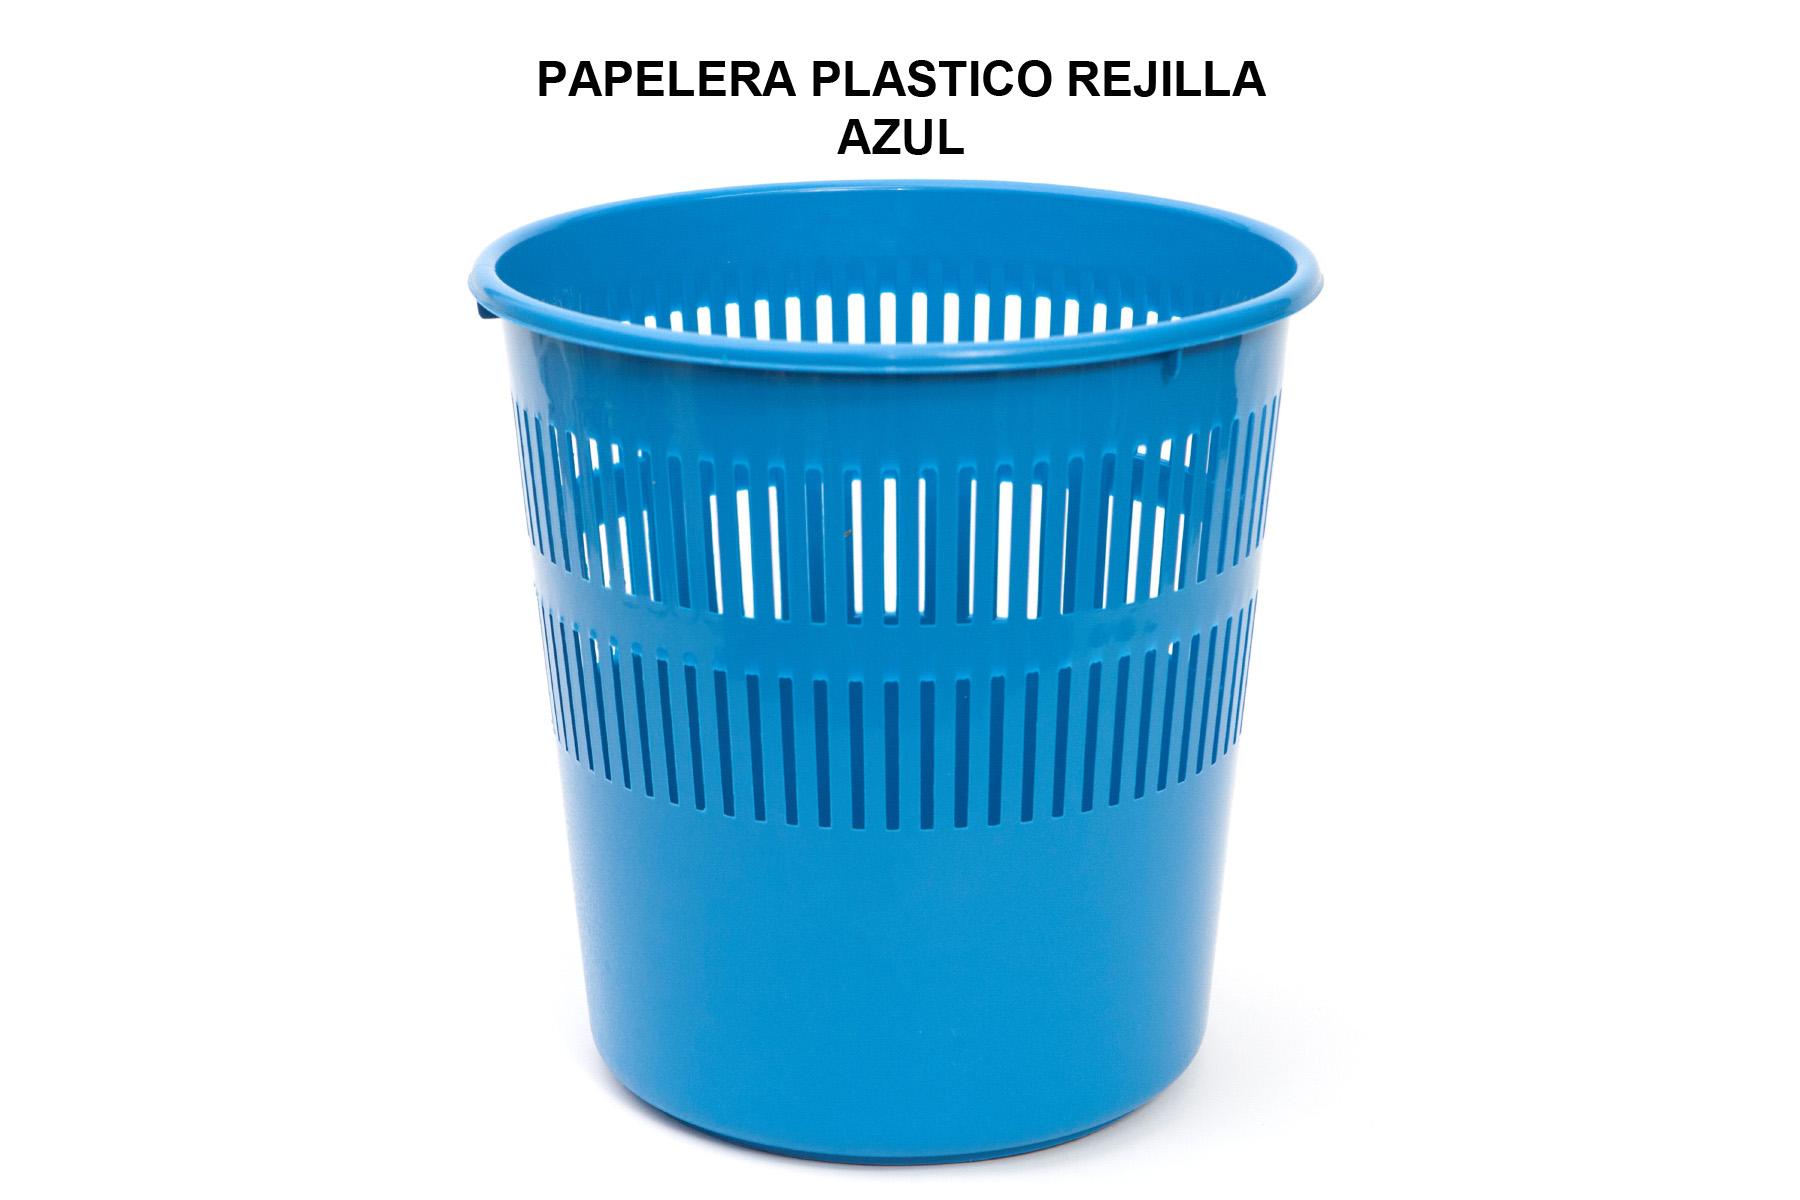 PAPELERA PLASTICO REJILLA AZUL